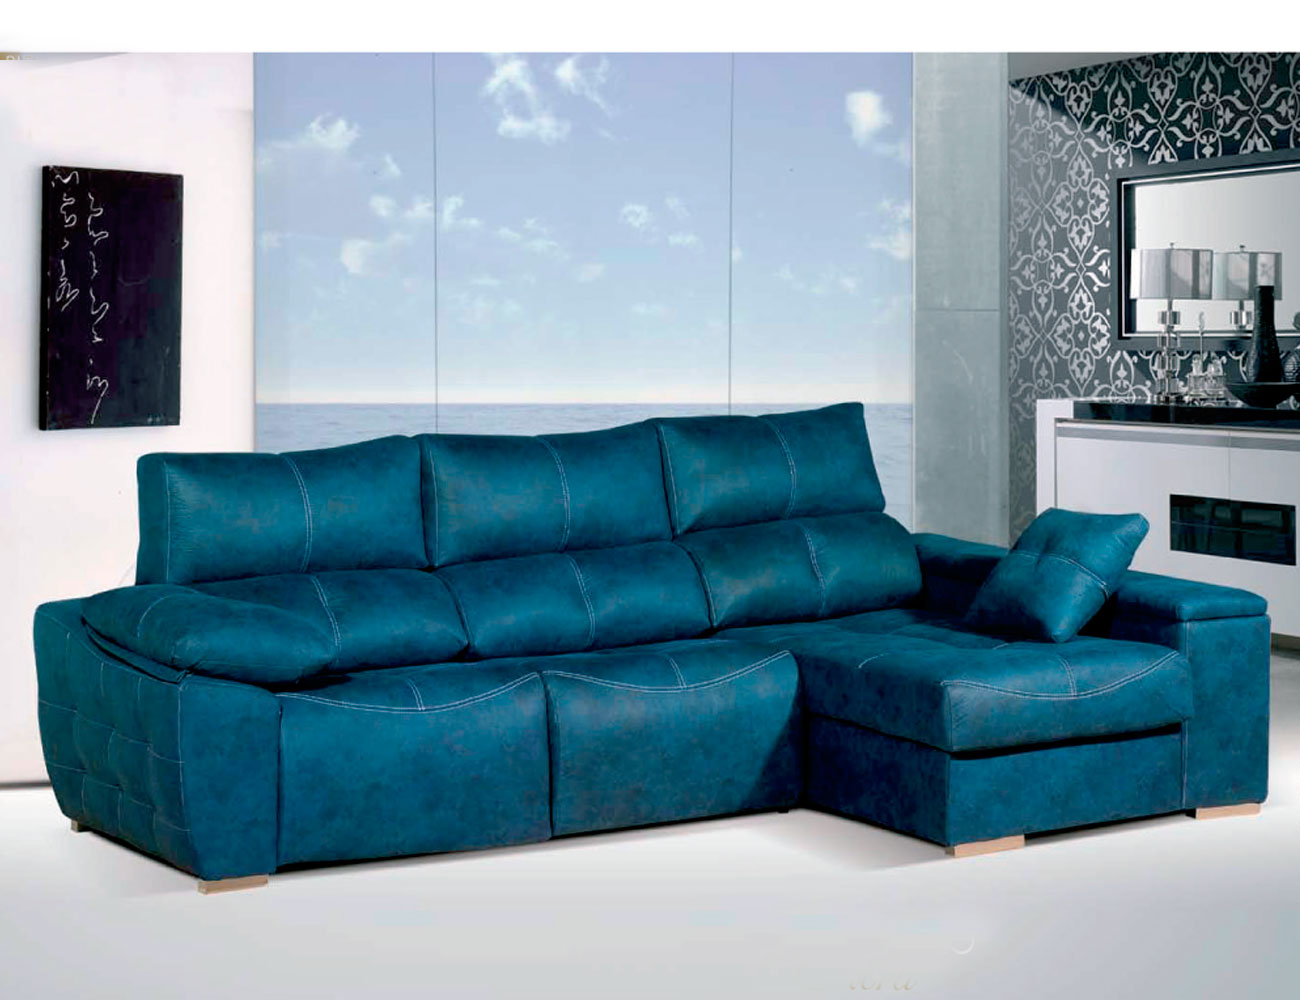 Sofa chaiselongue relax 2 motores anti manchas turquesa49